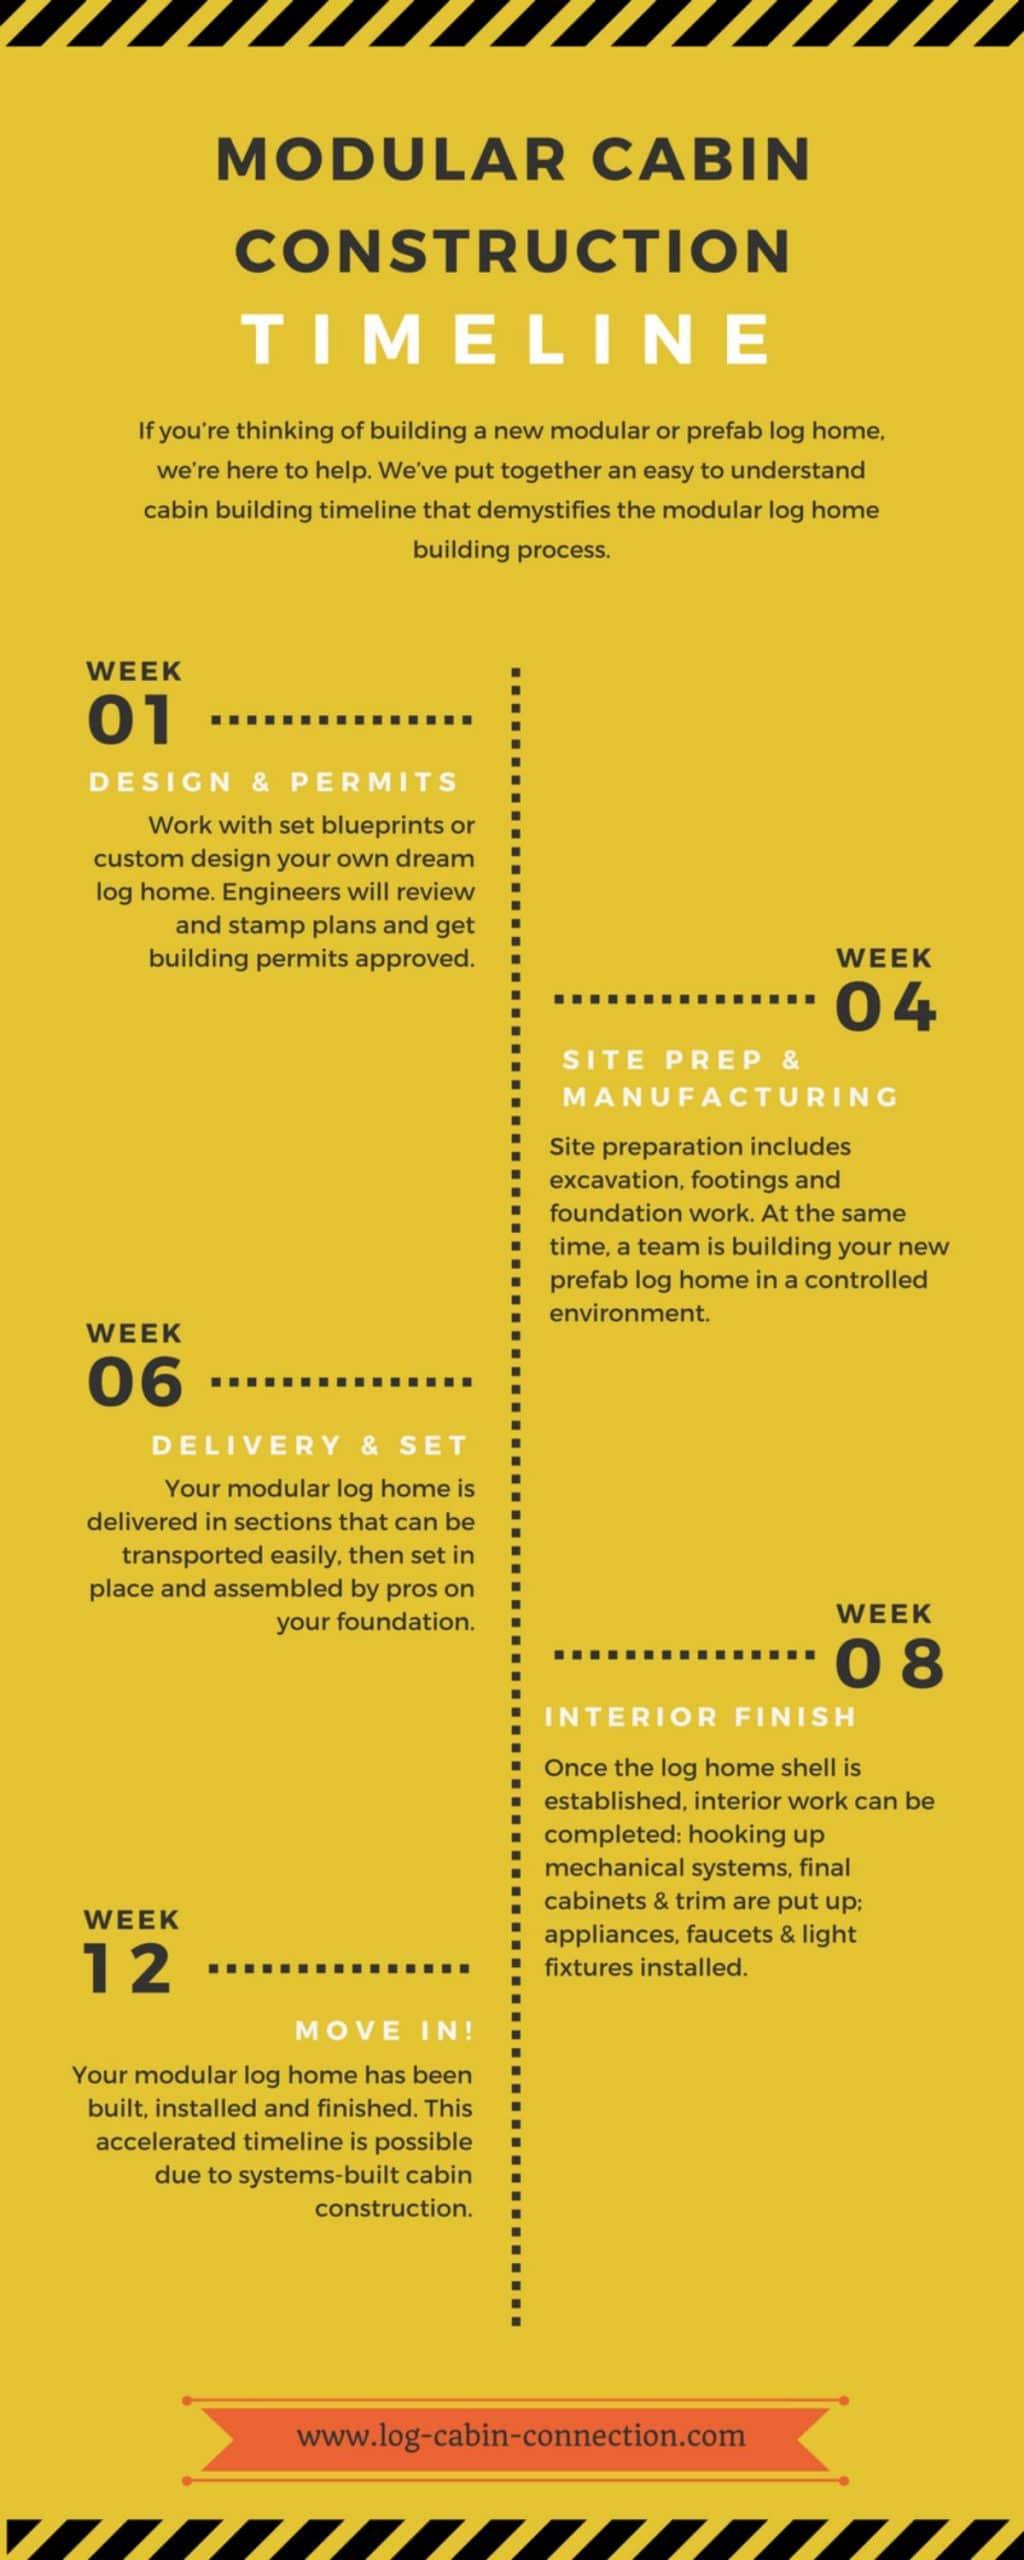 modular cabin construction timeline